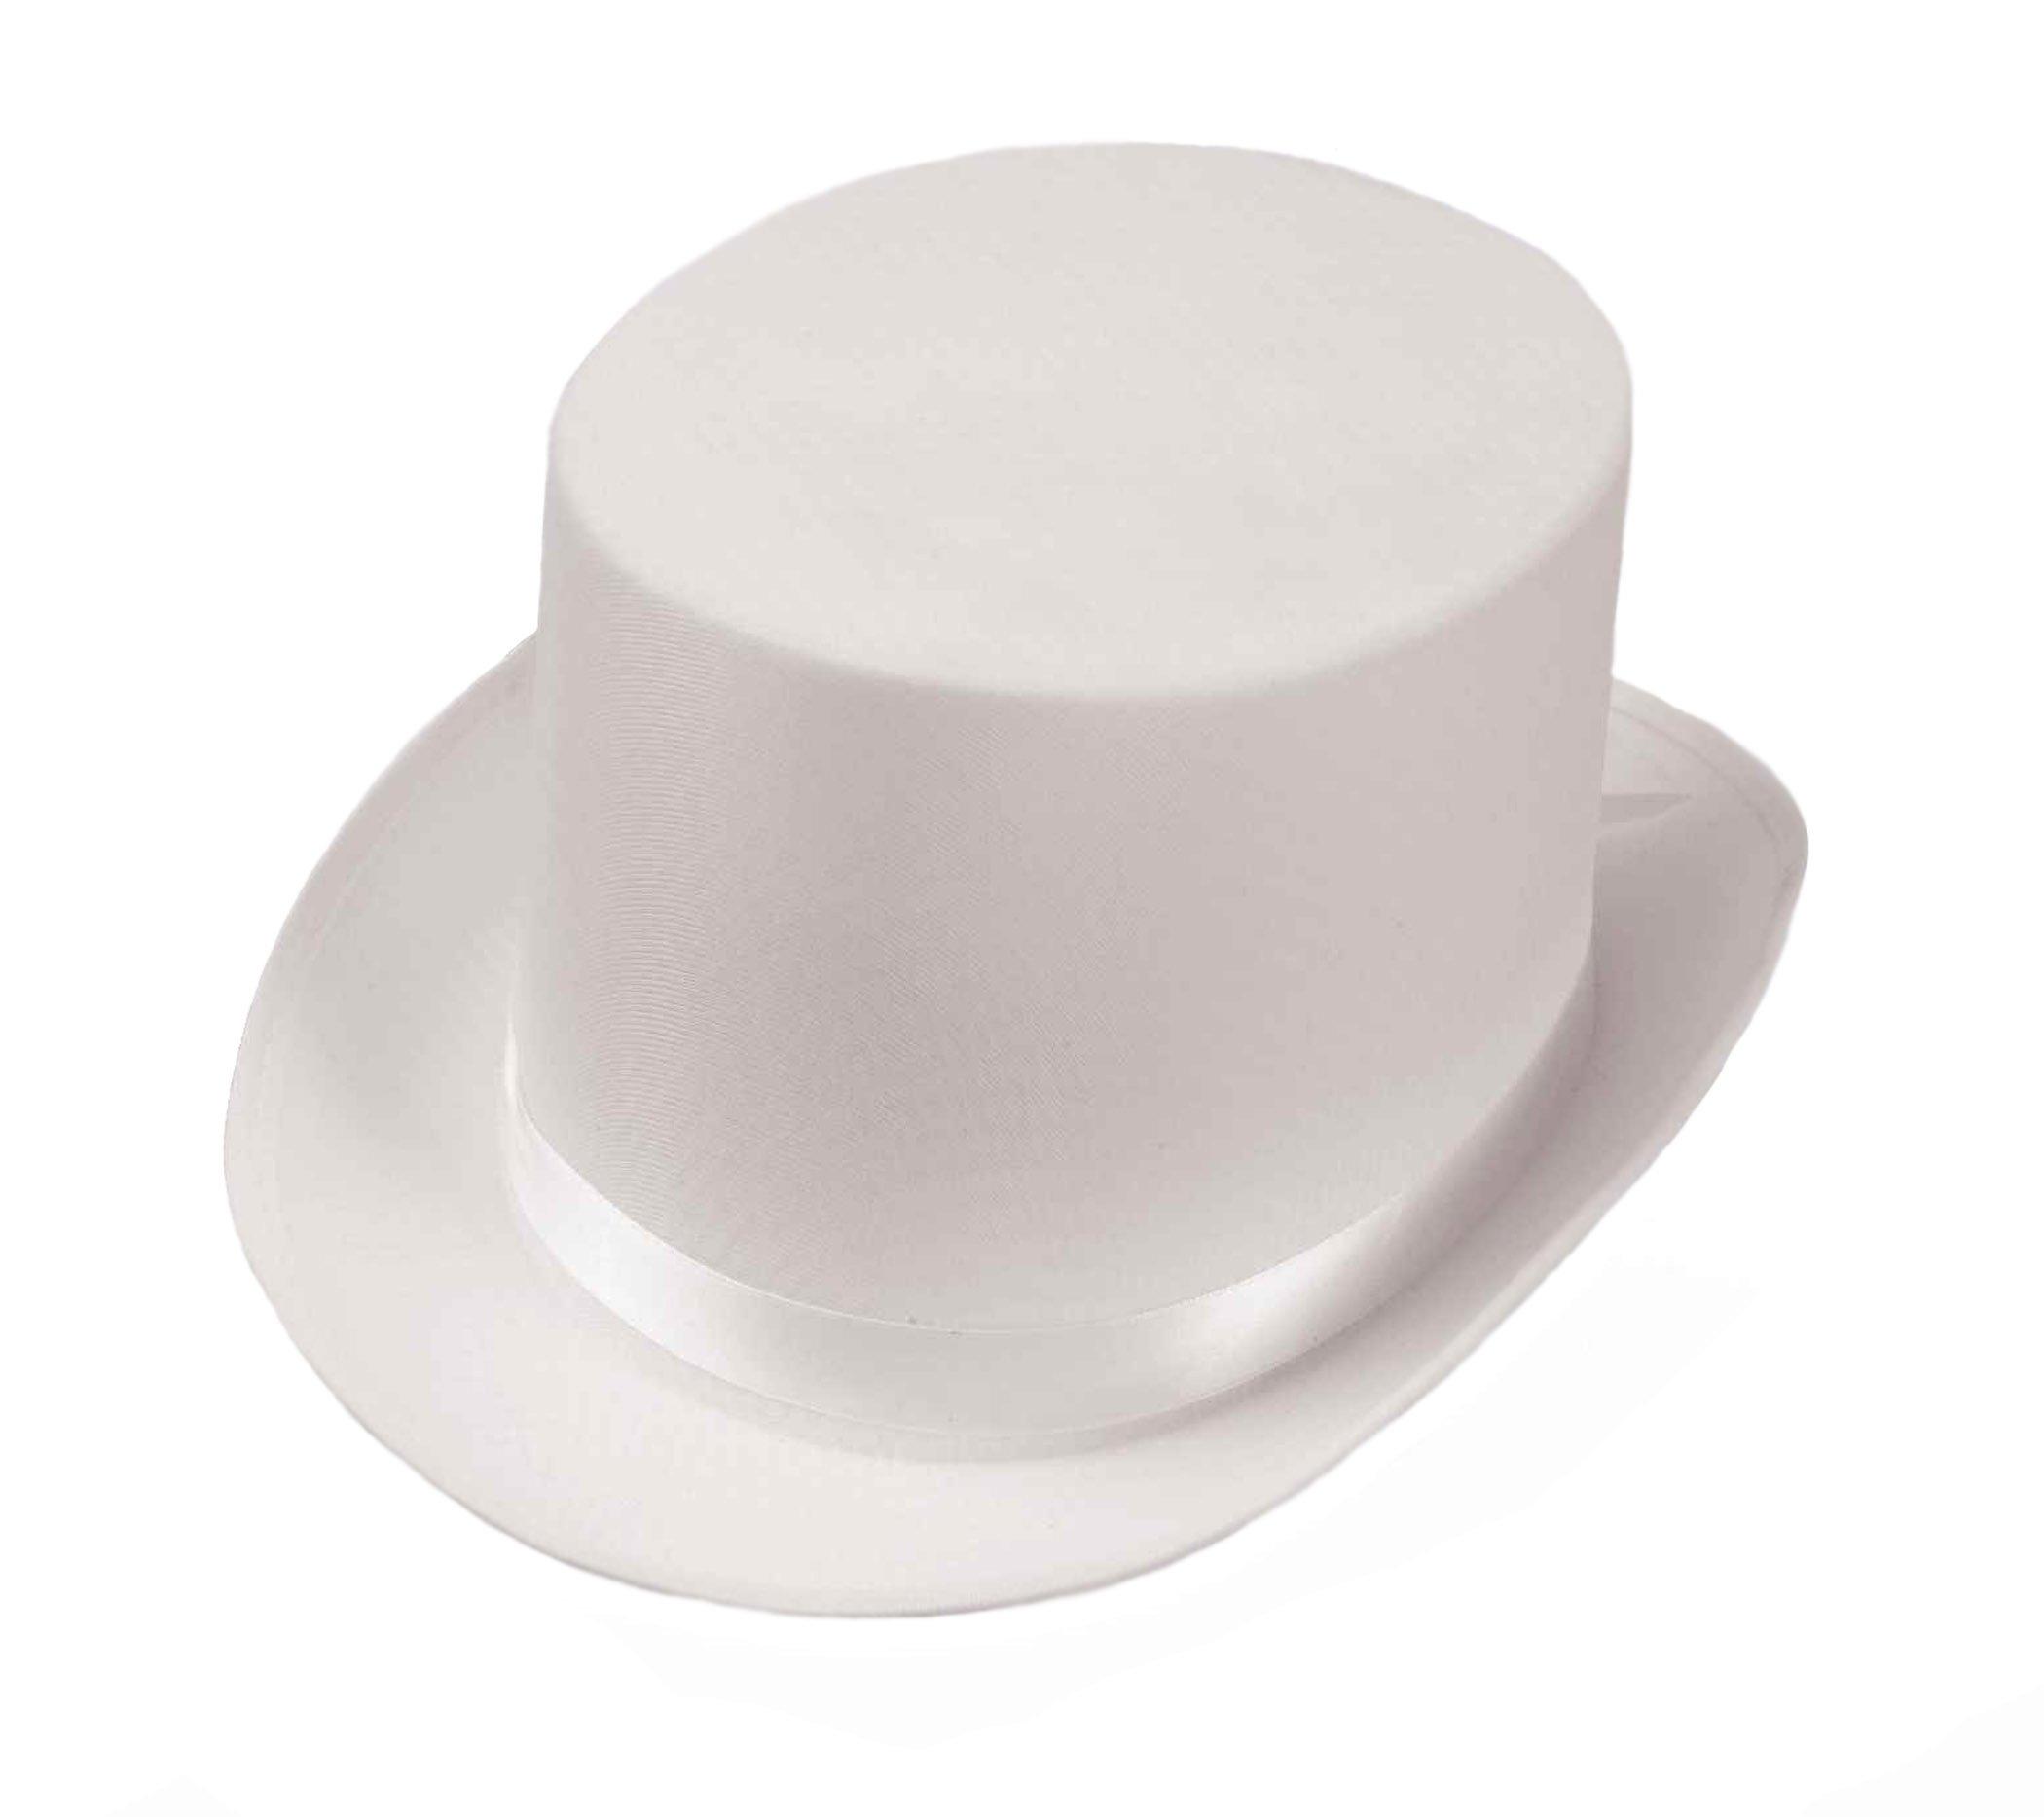 Beistle Satin Sleek White Top Hat